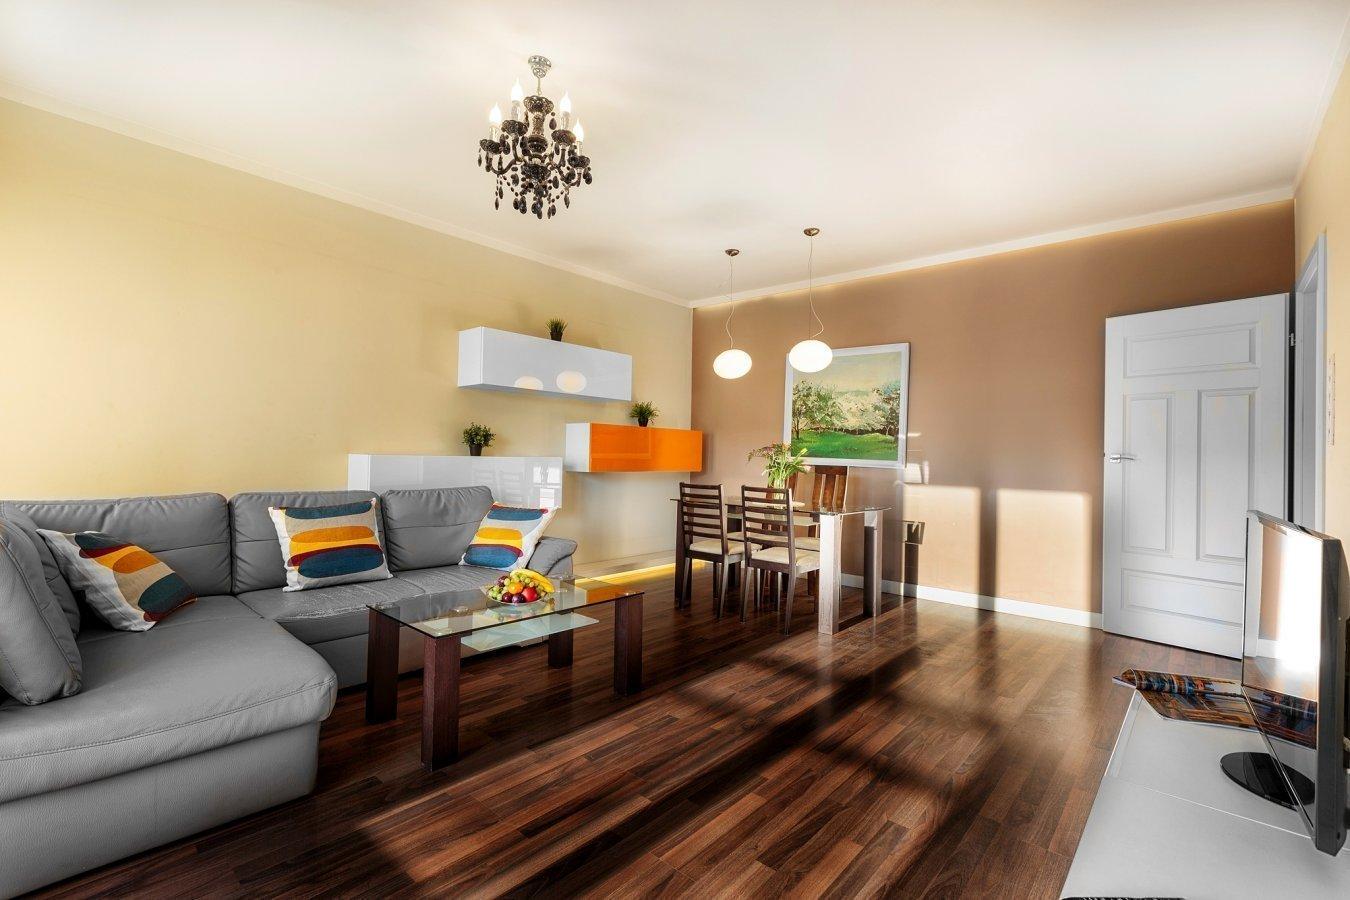 Living room at Zeligowskiego Apartments